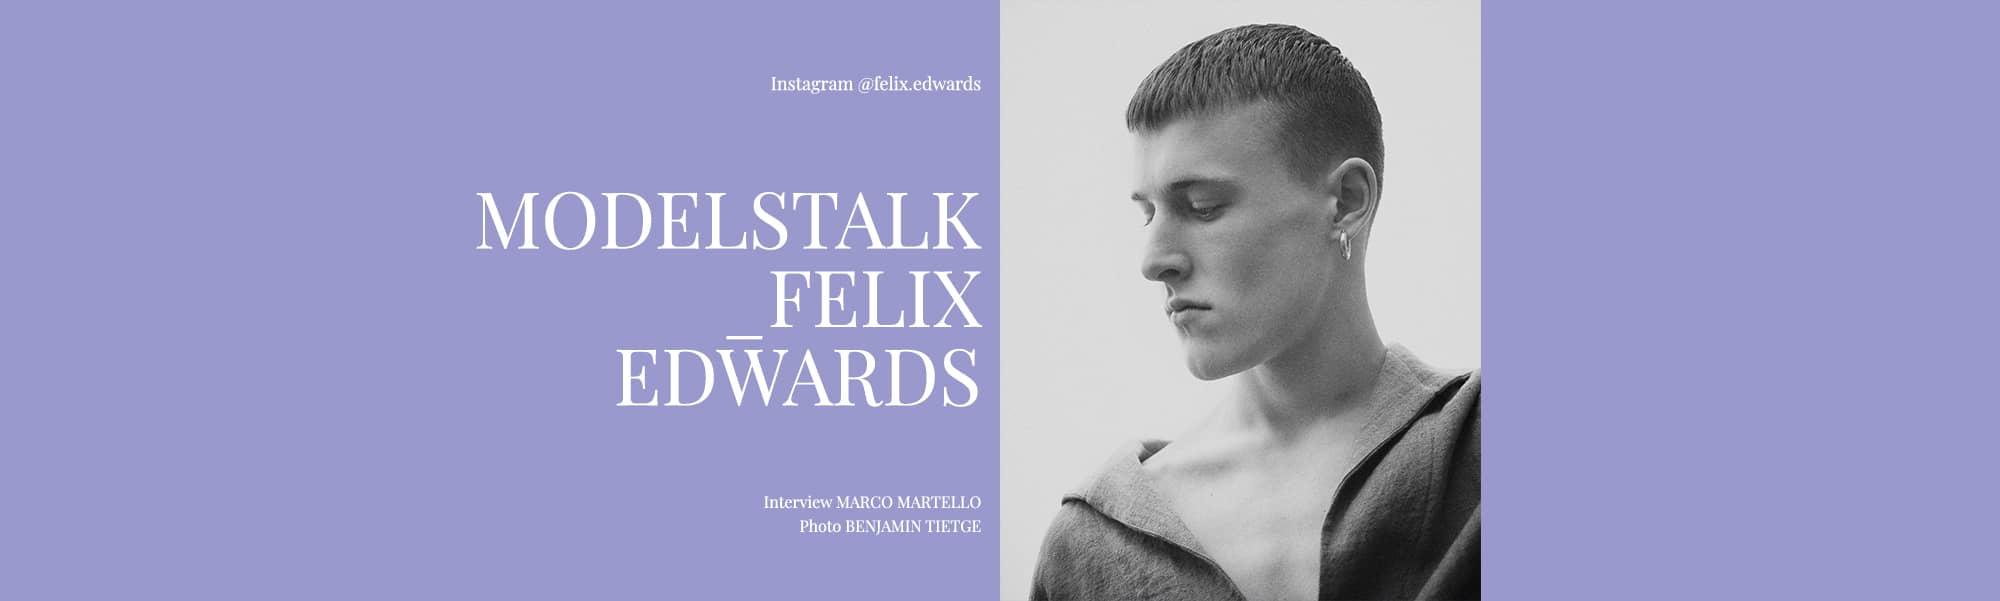 thegreatestmagazine_FELIX-edwards_talkingheads-main-banner